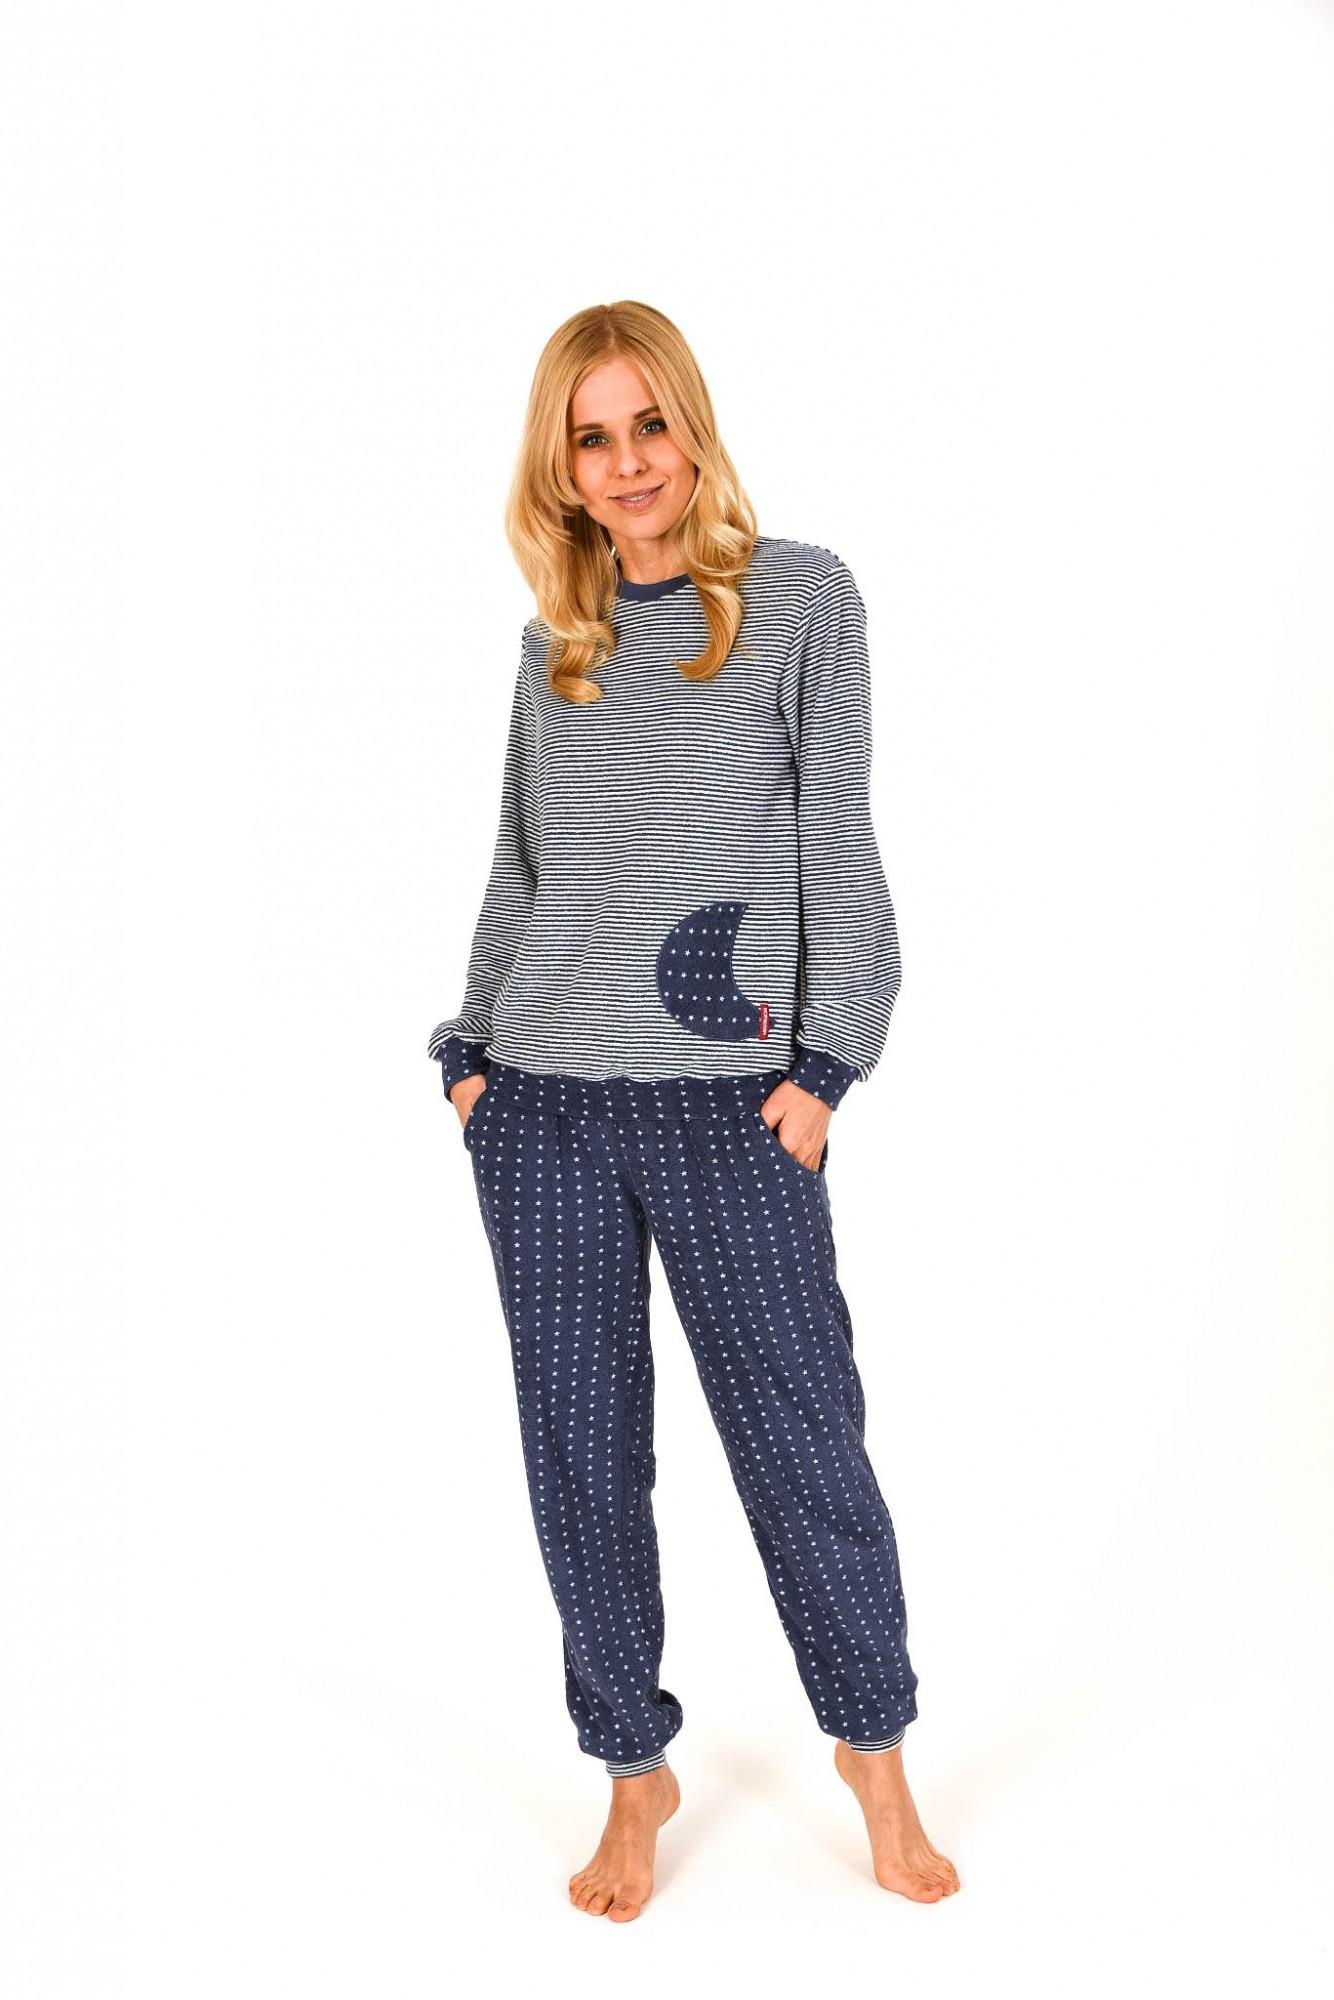 Damen Frottee Pyjama lang mit Bündchen – 59772 - 93 200